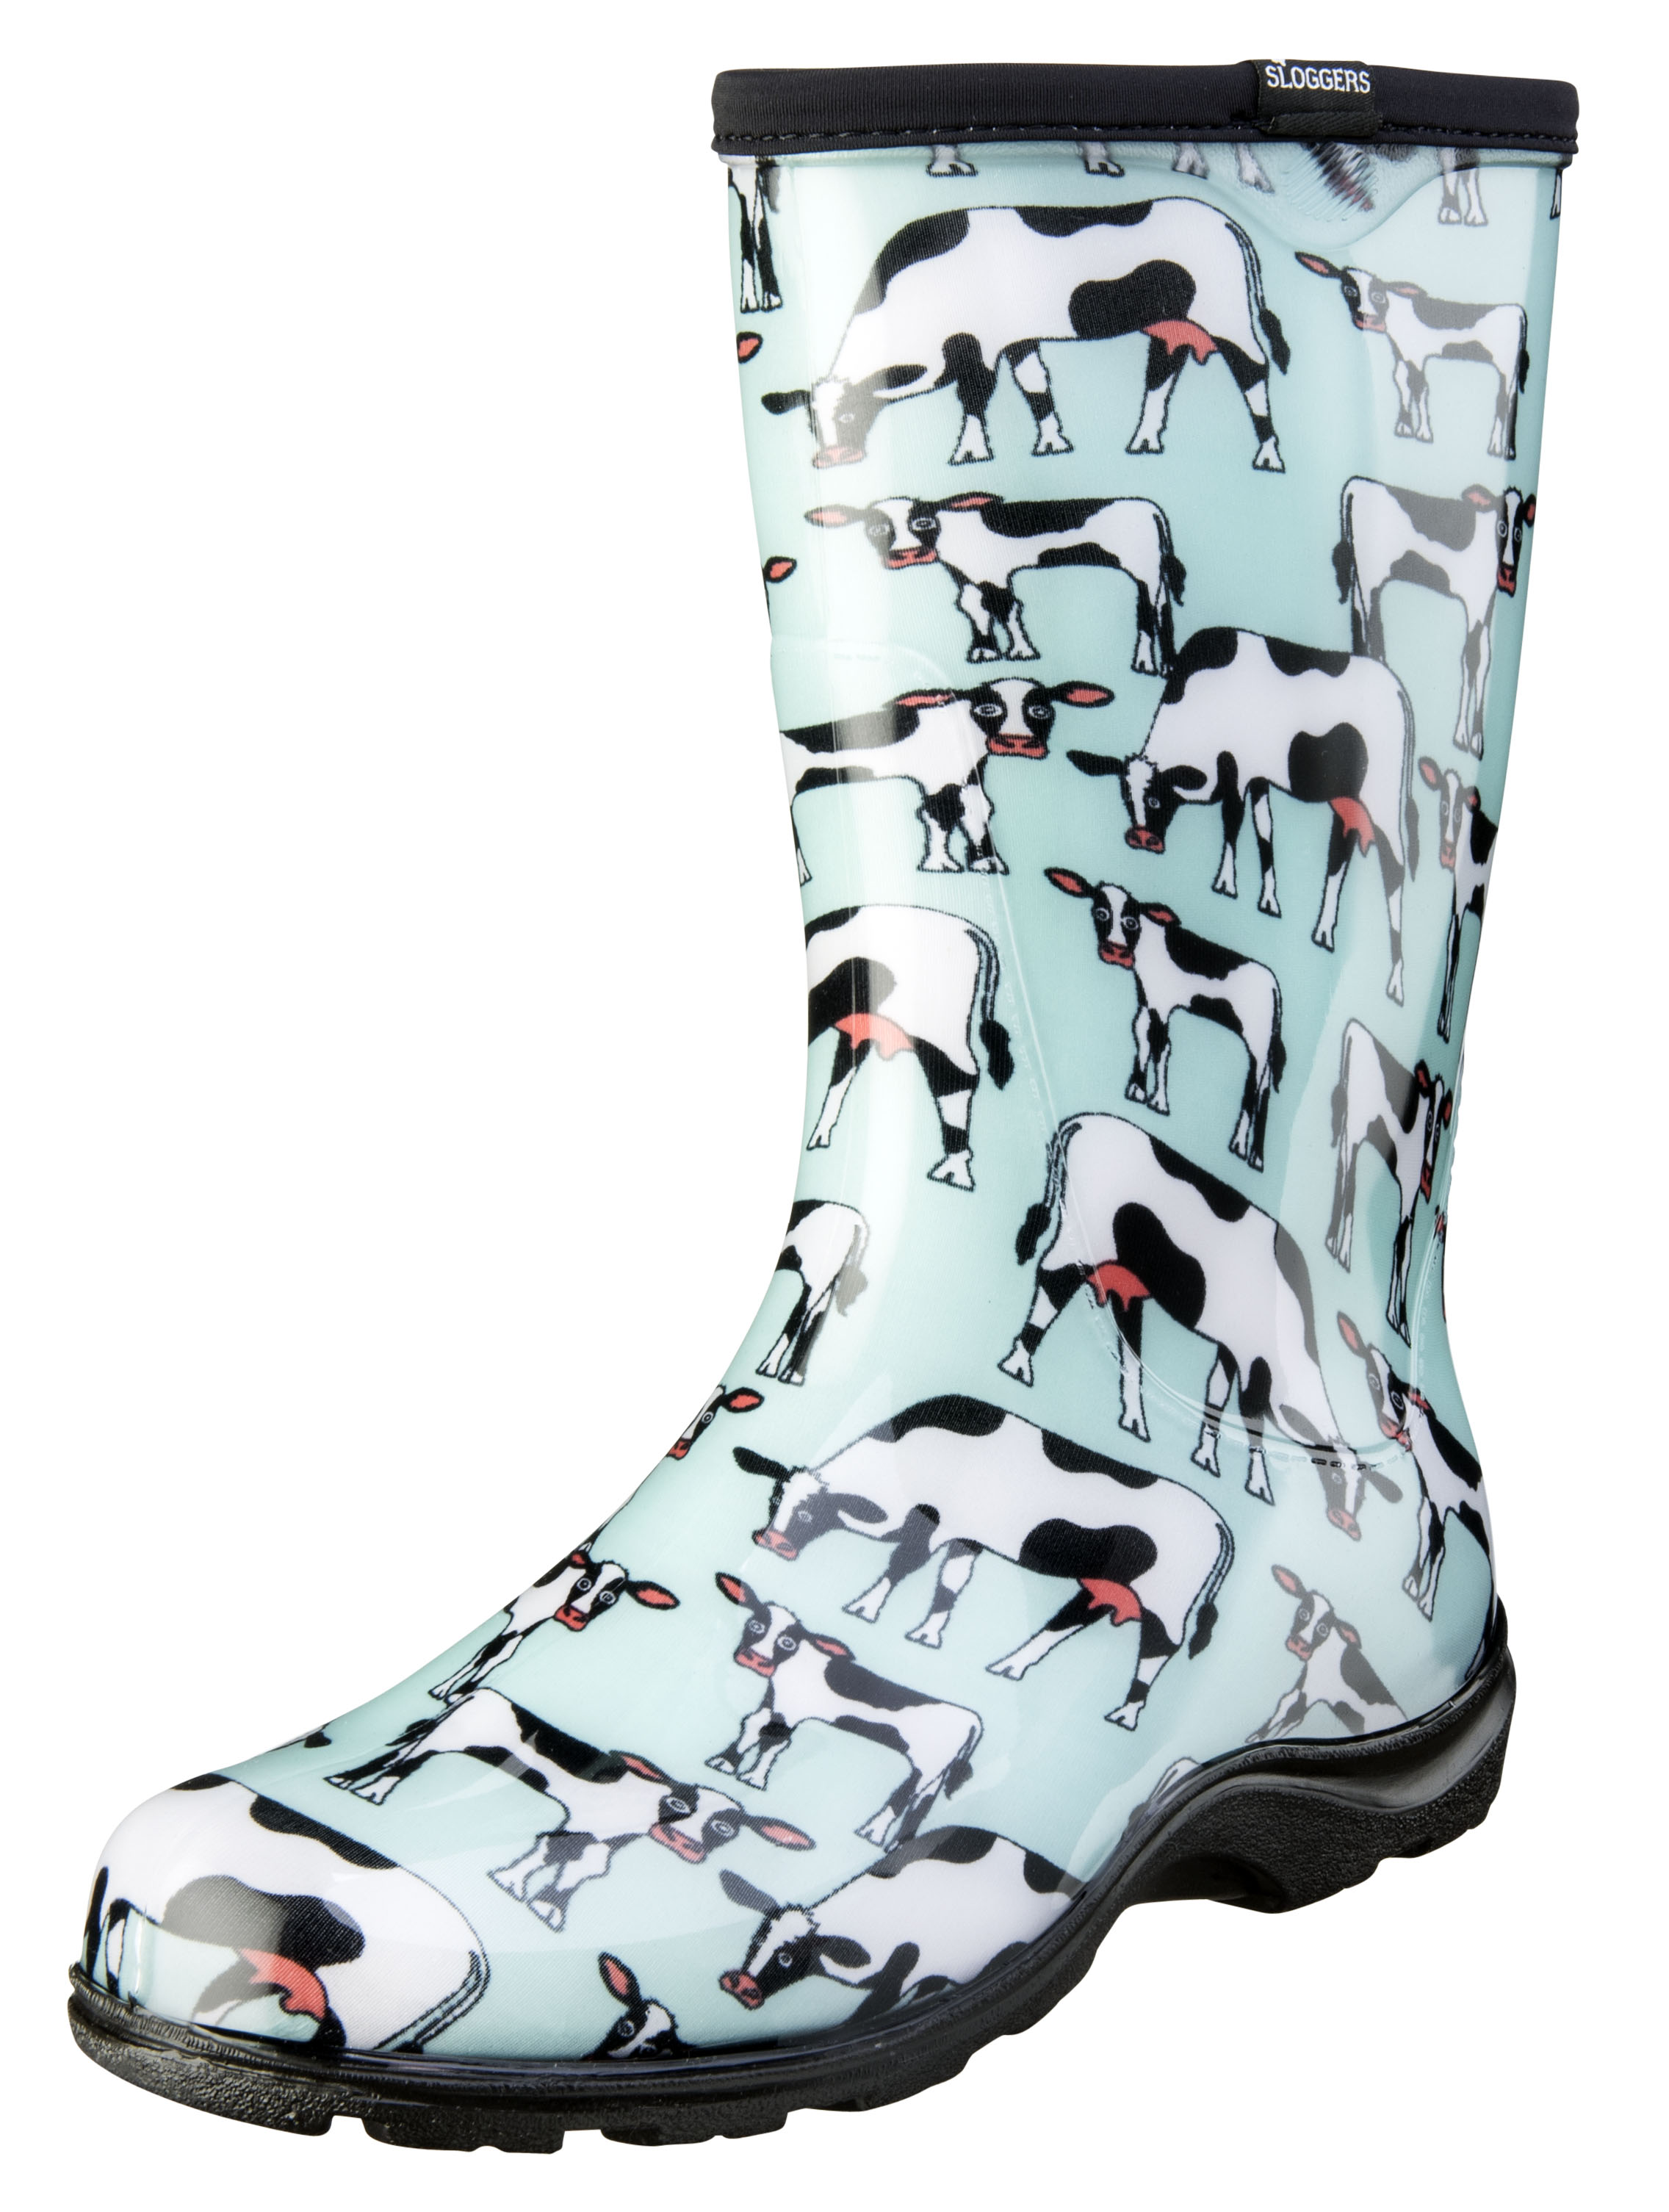 Sloggers Women's Rain and Garden Boot